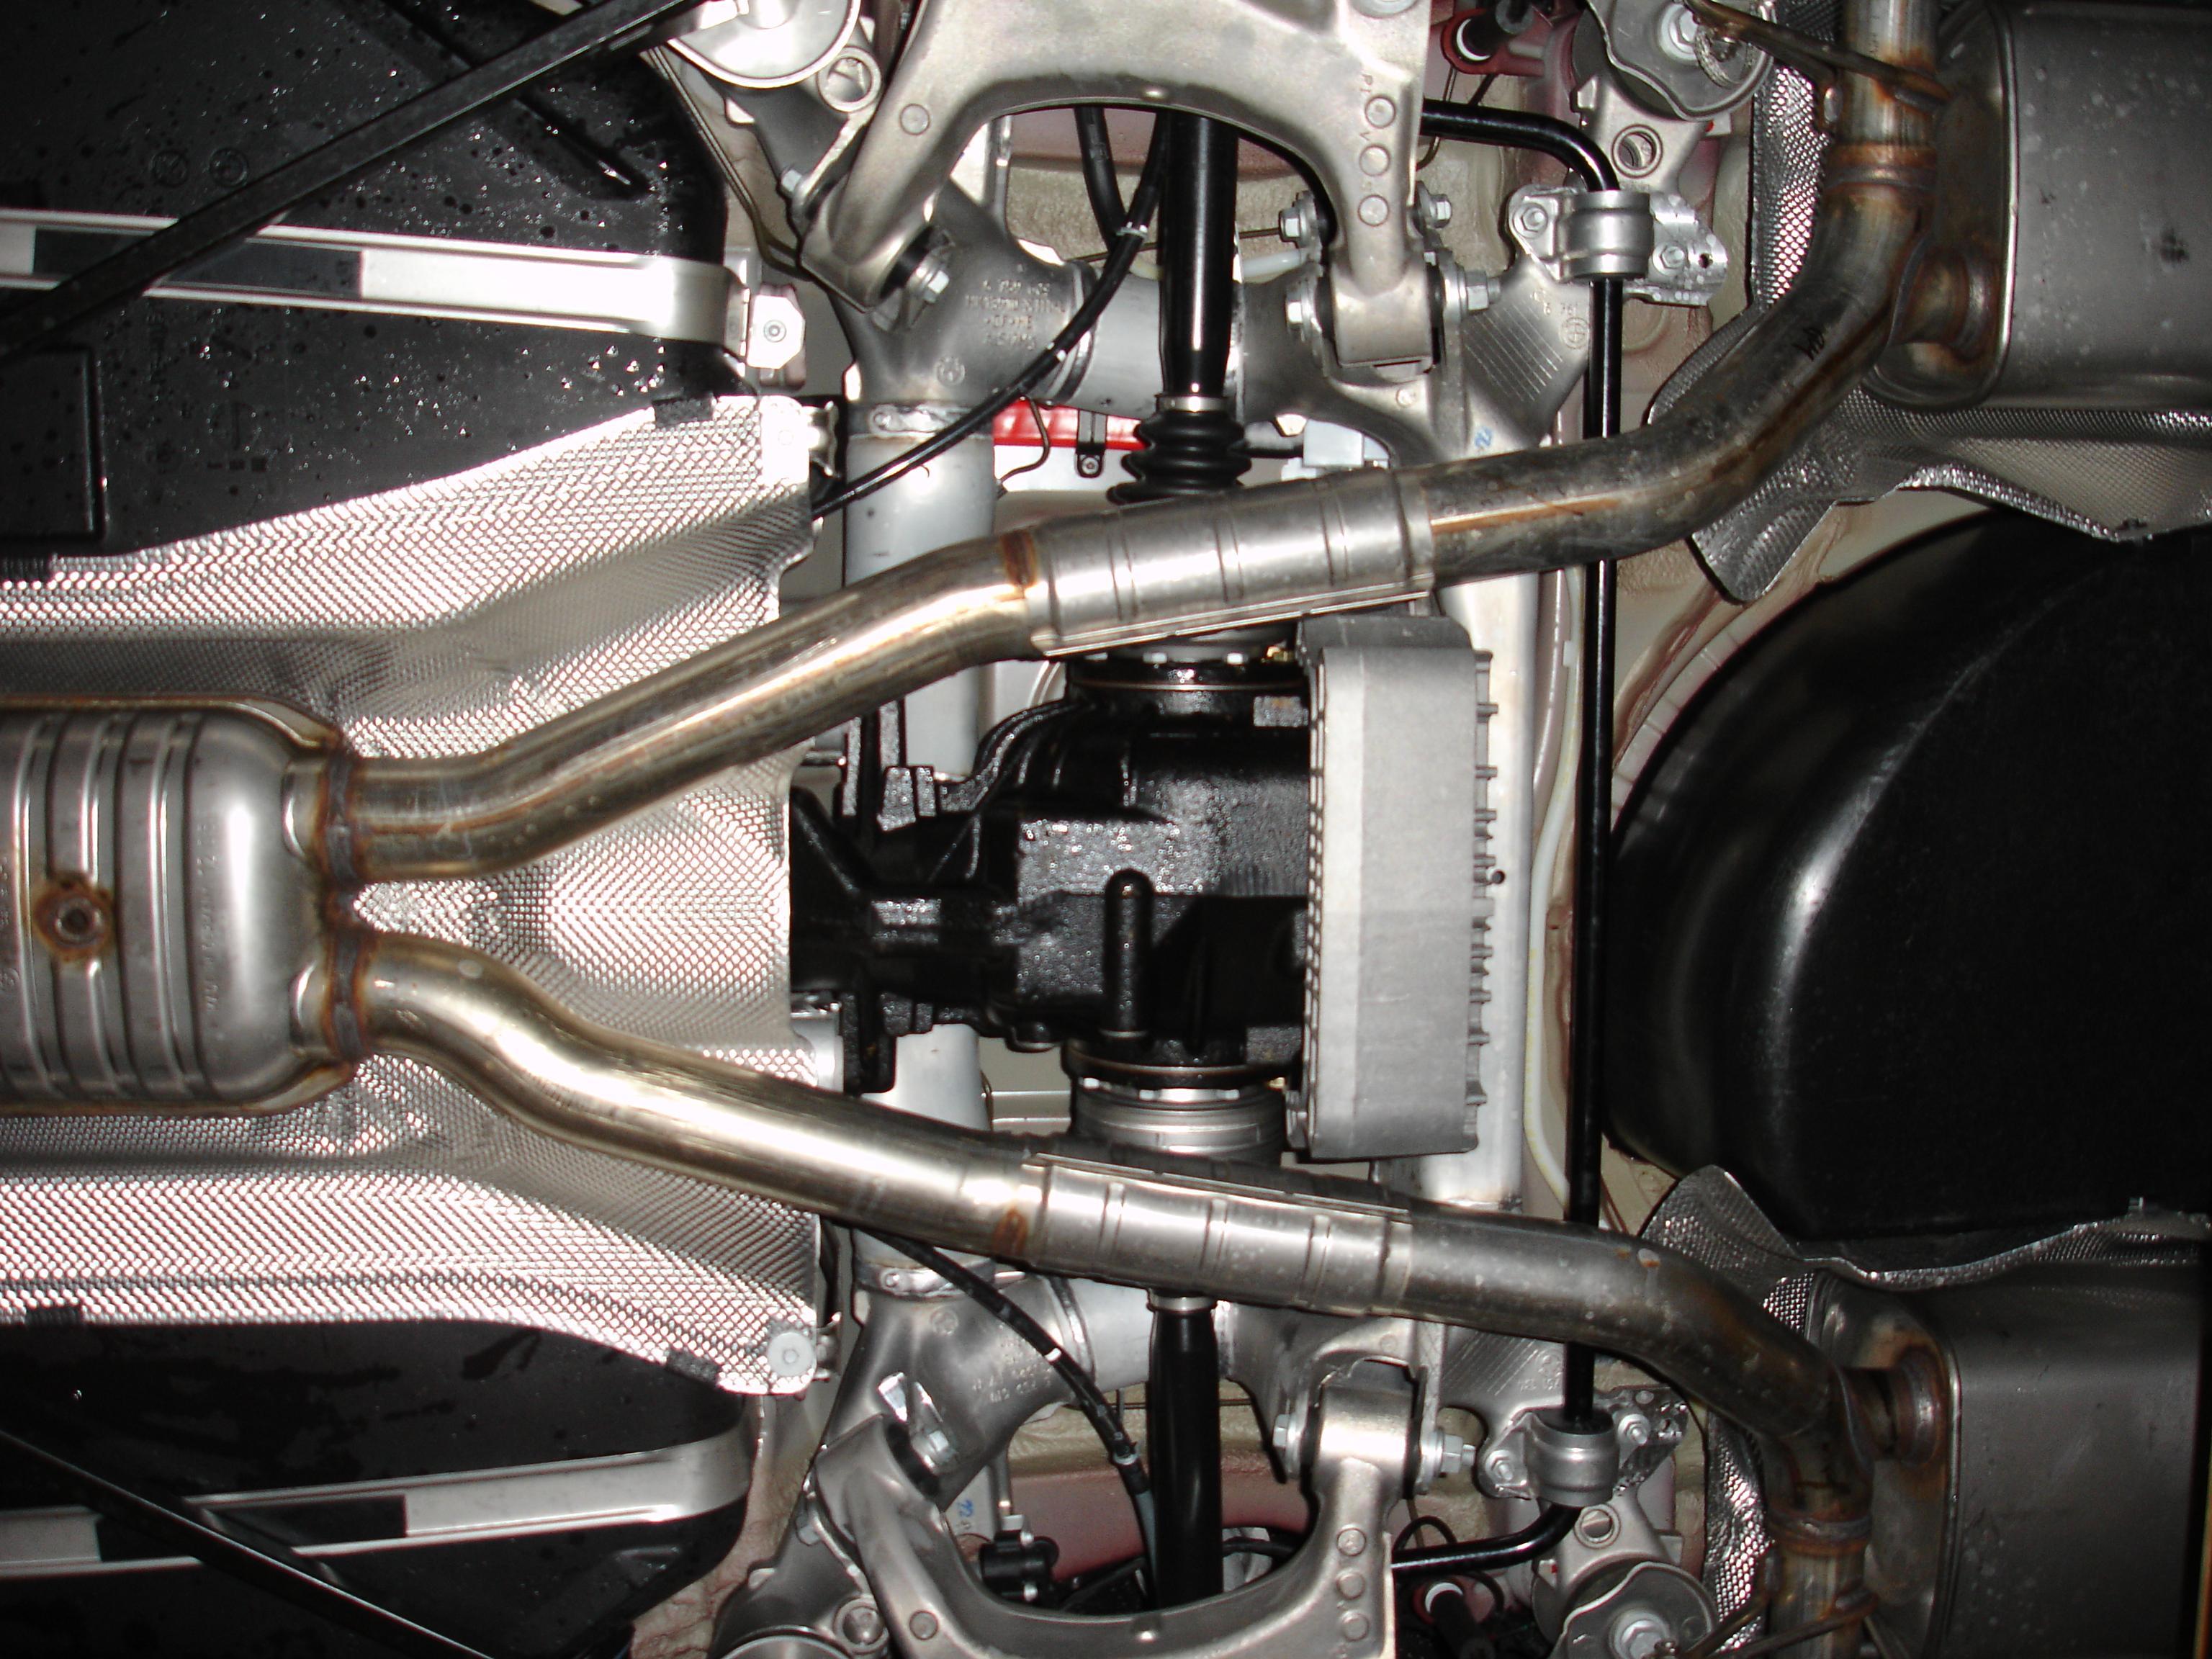 ... Underside Pics and an exhaust question-underside-4.jpg